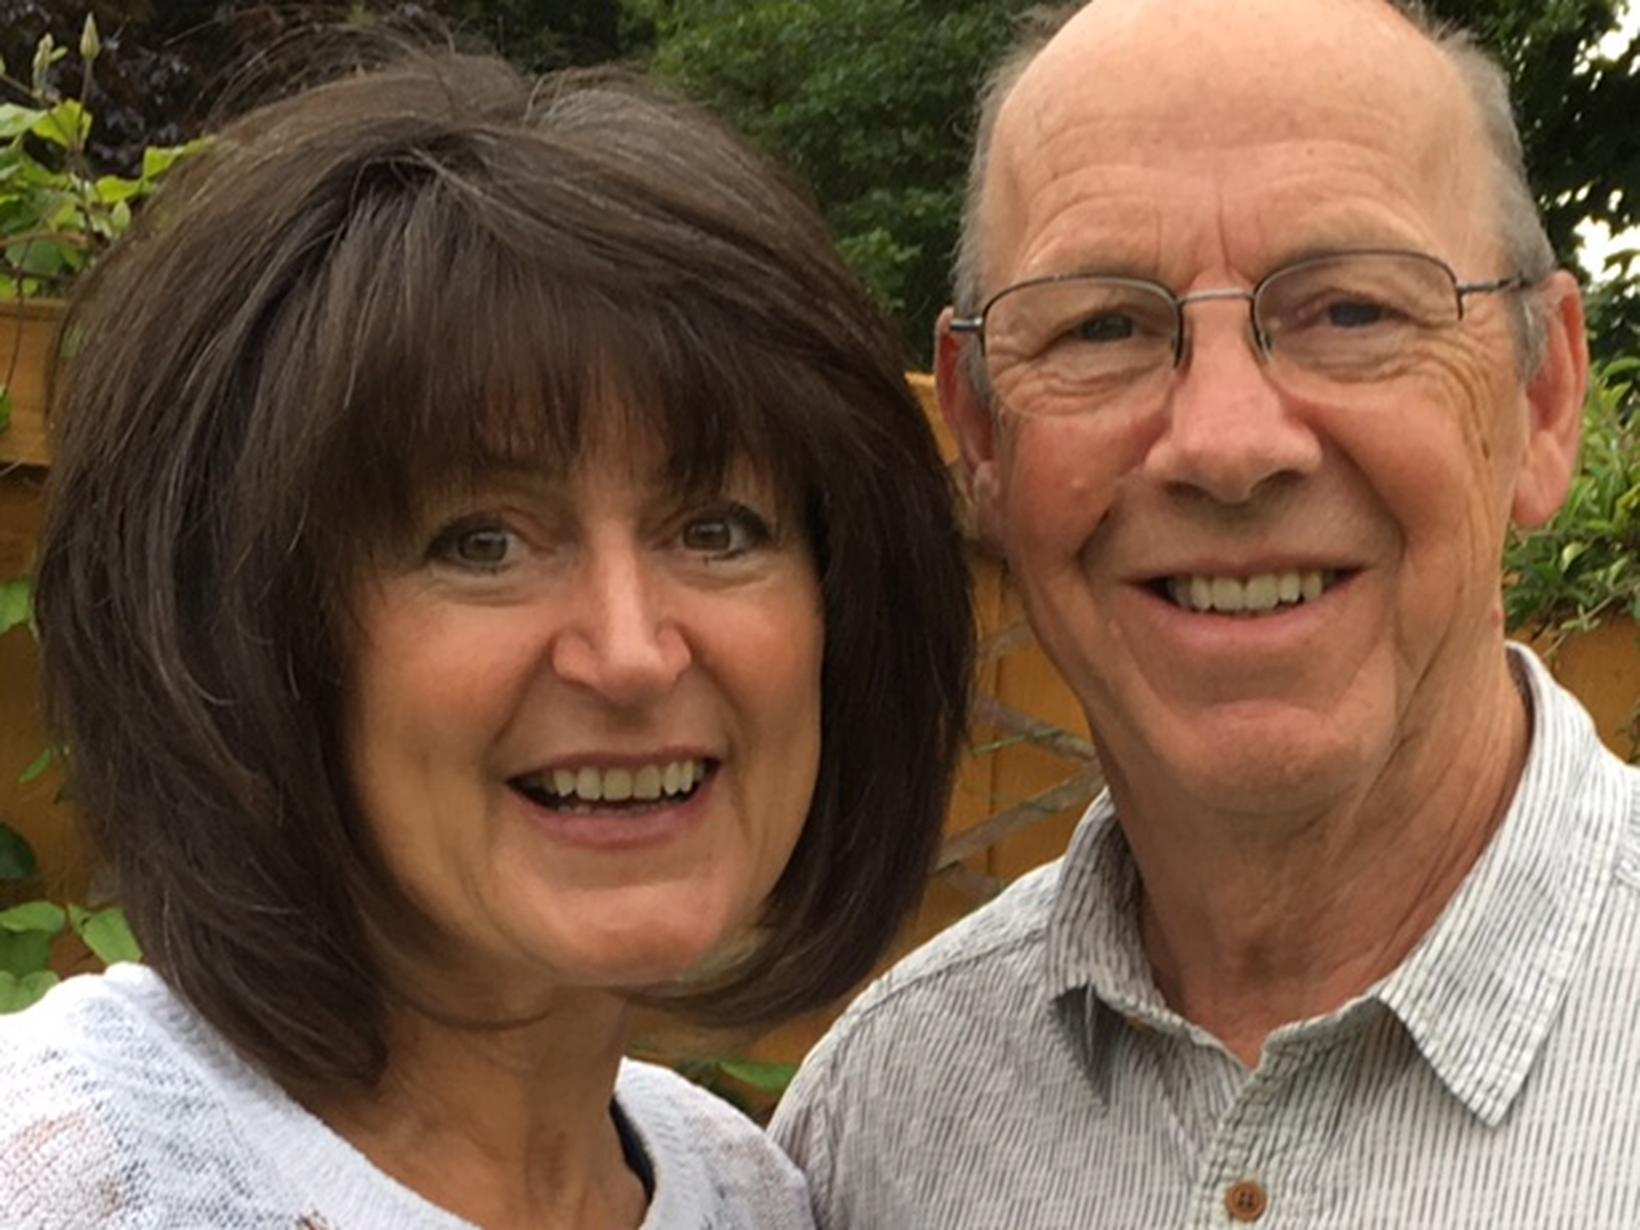 Lindsey & Michael from Rhôs-on-Sea, United Kingdom